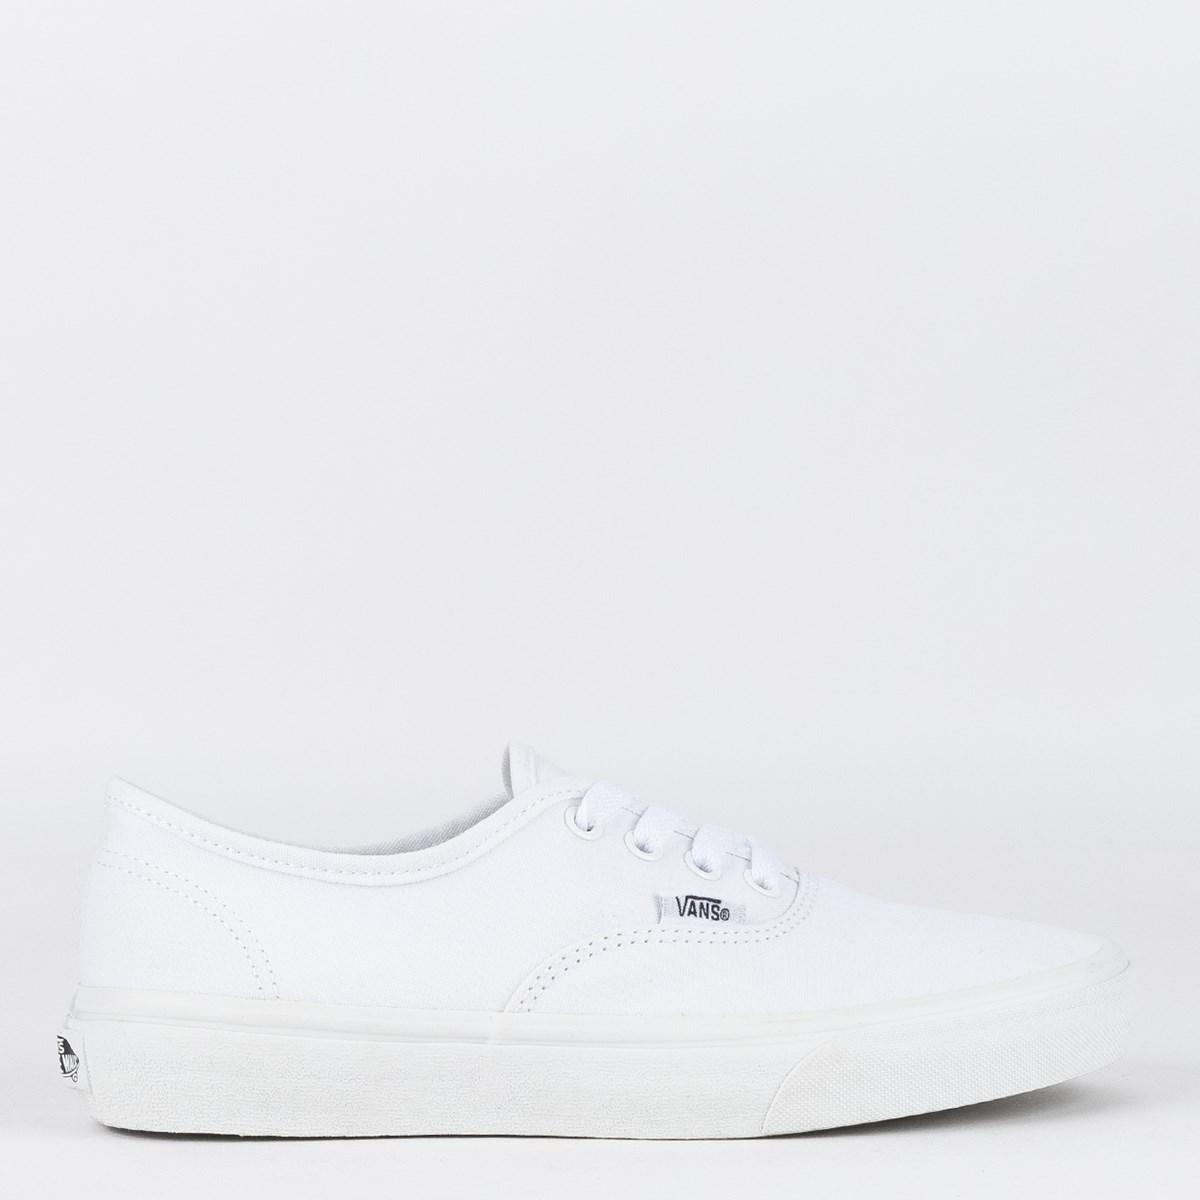 Tênis Vans Authentic True White VN - 0EE3W00